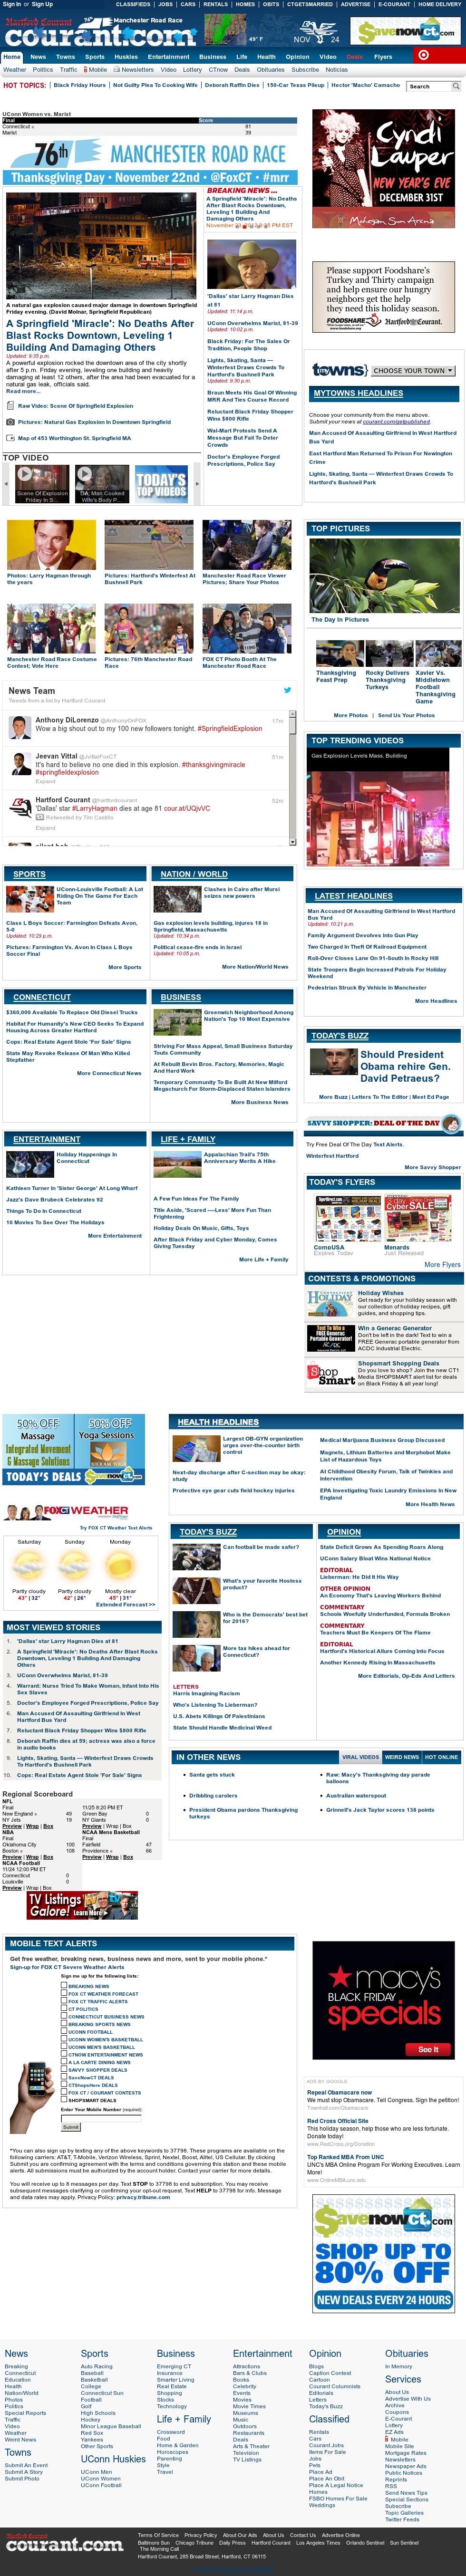 Hartford Courant at Saturday Nov. 24, 2012, 5:14 a.m. UTC